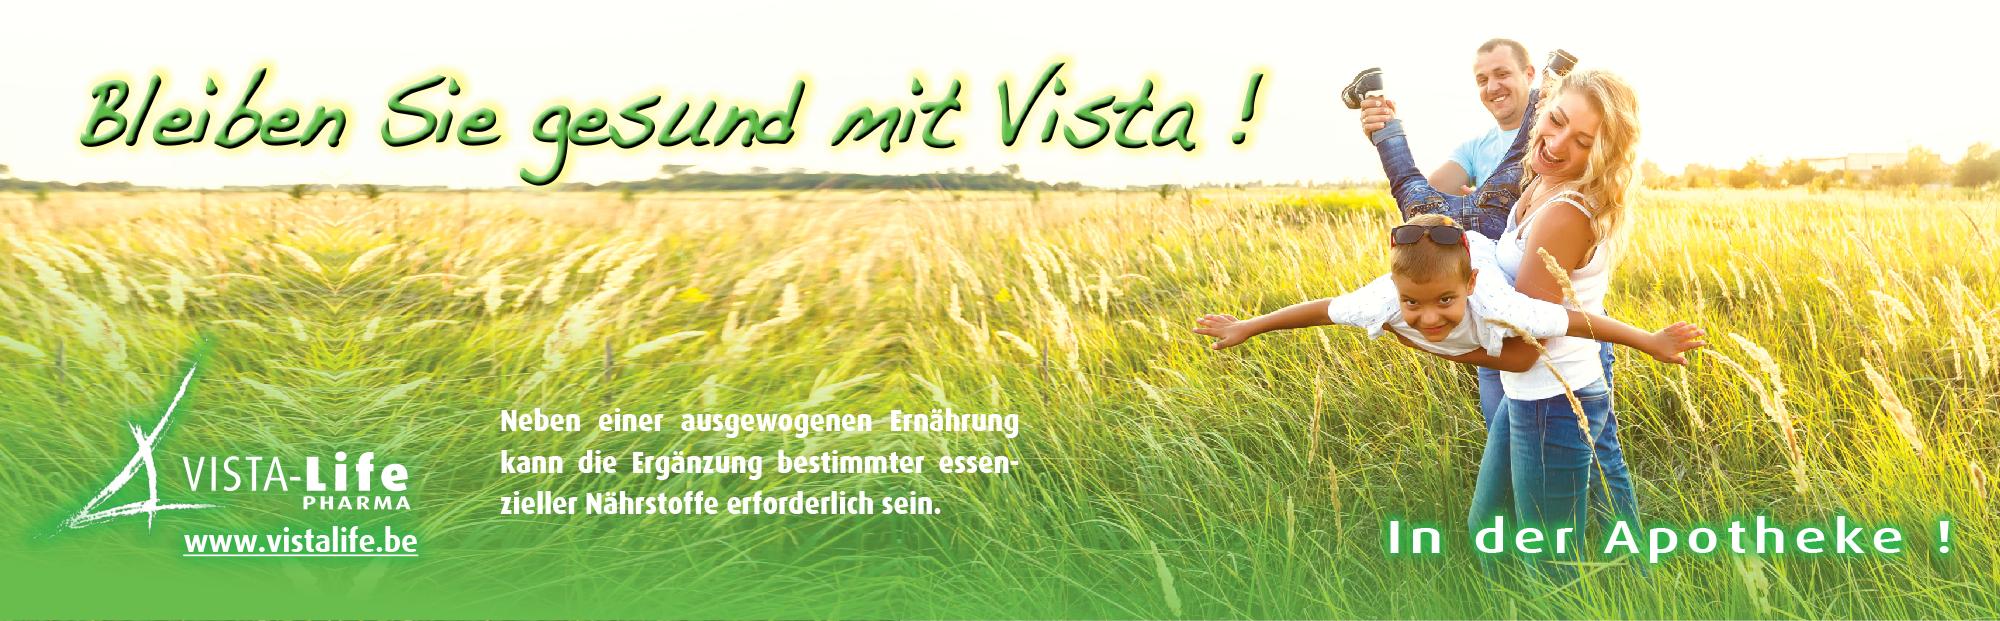 vista-life-pharma-(topbanner)1dui